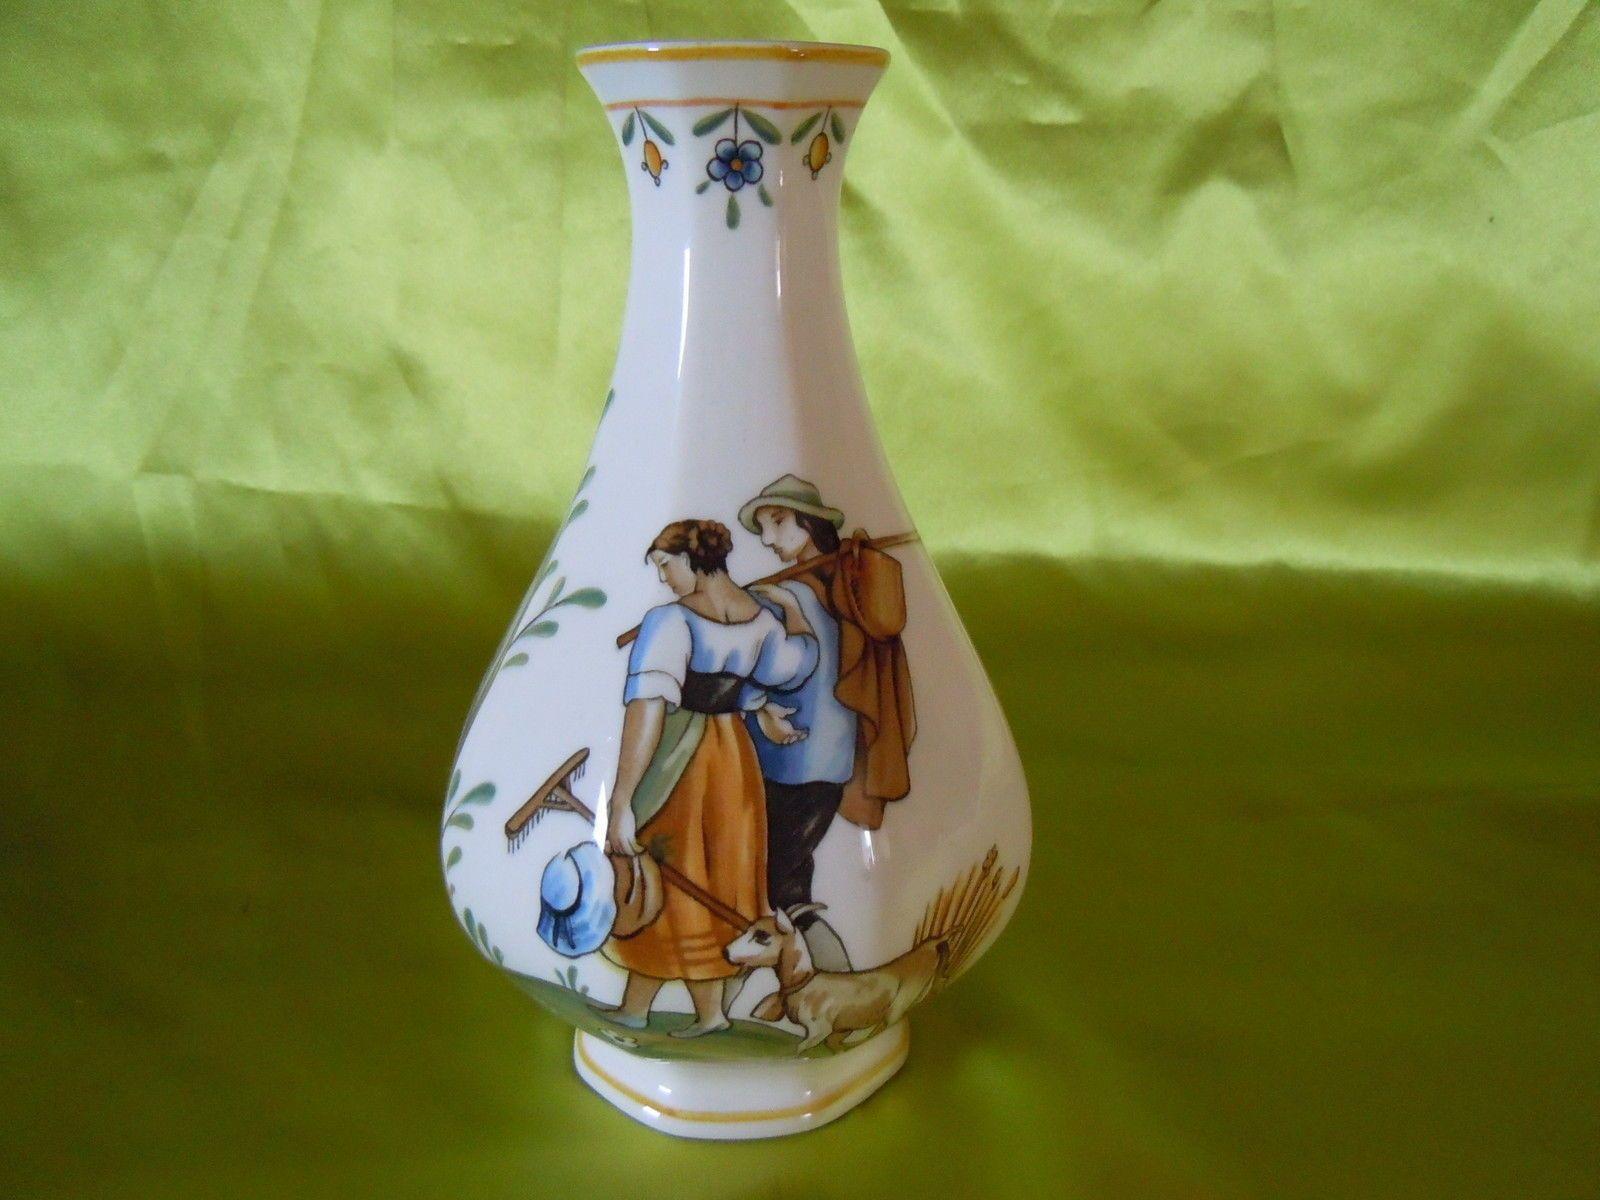 Rare vase villeroy et boch country villeroy boch pinterest rare vase villeroy et boch country reviewsmspy